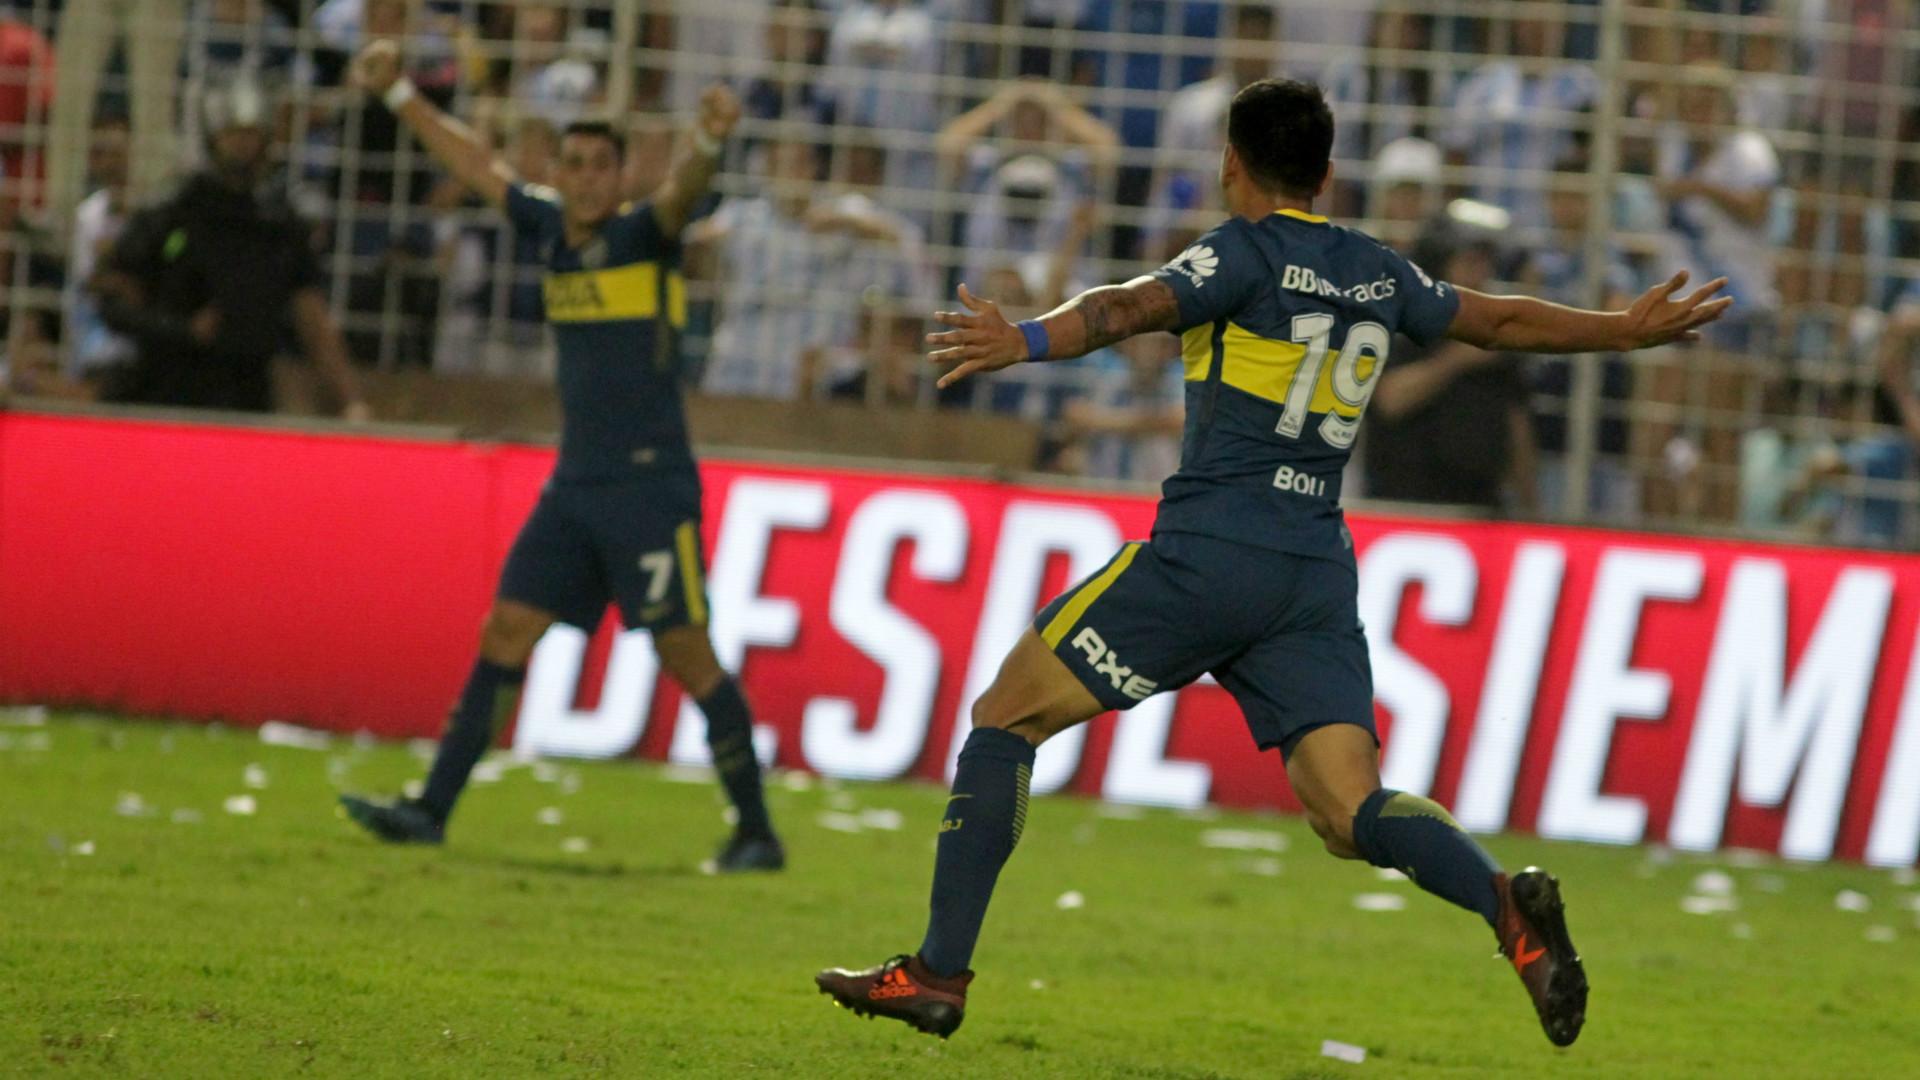 Bou Atletico Tucuman Boca Superliga Fecha 20 18032018